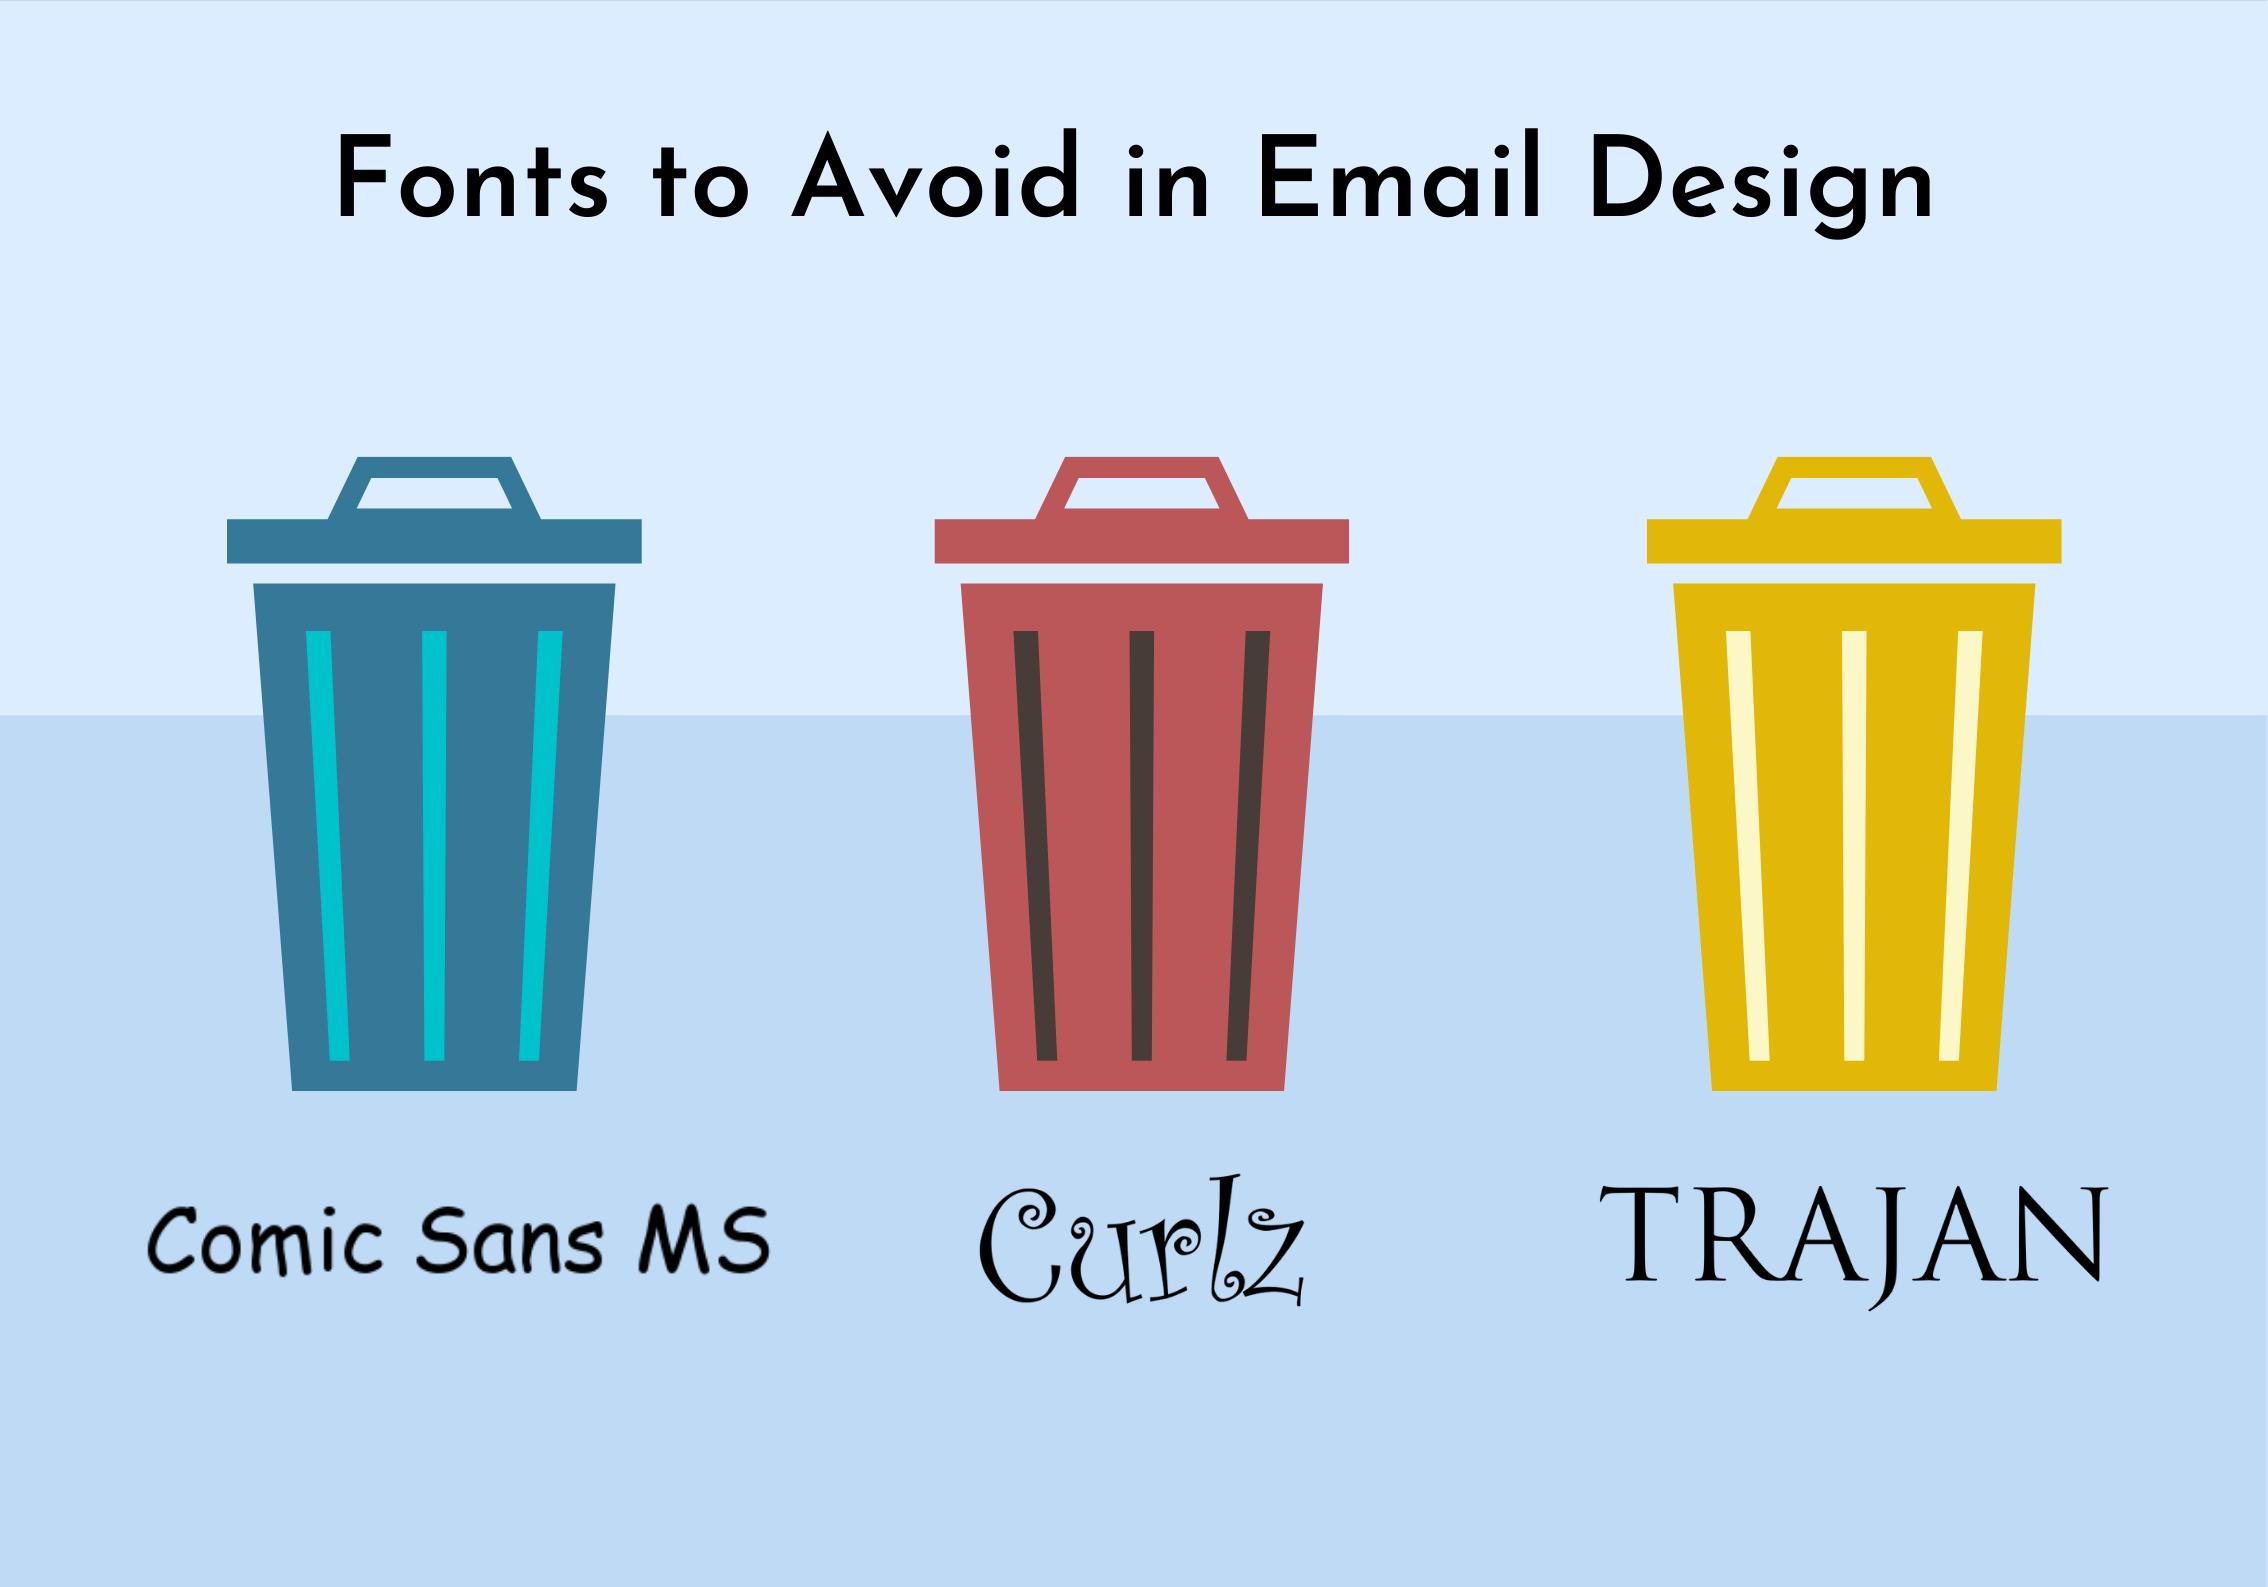 Worst fonts for email design